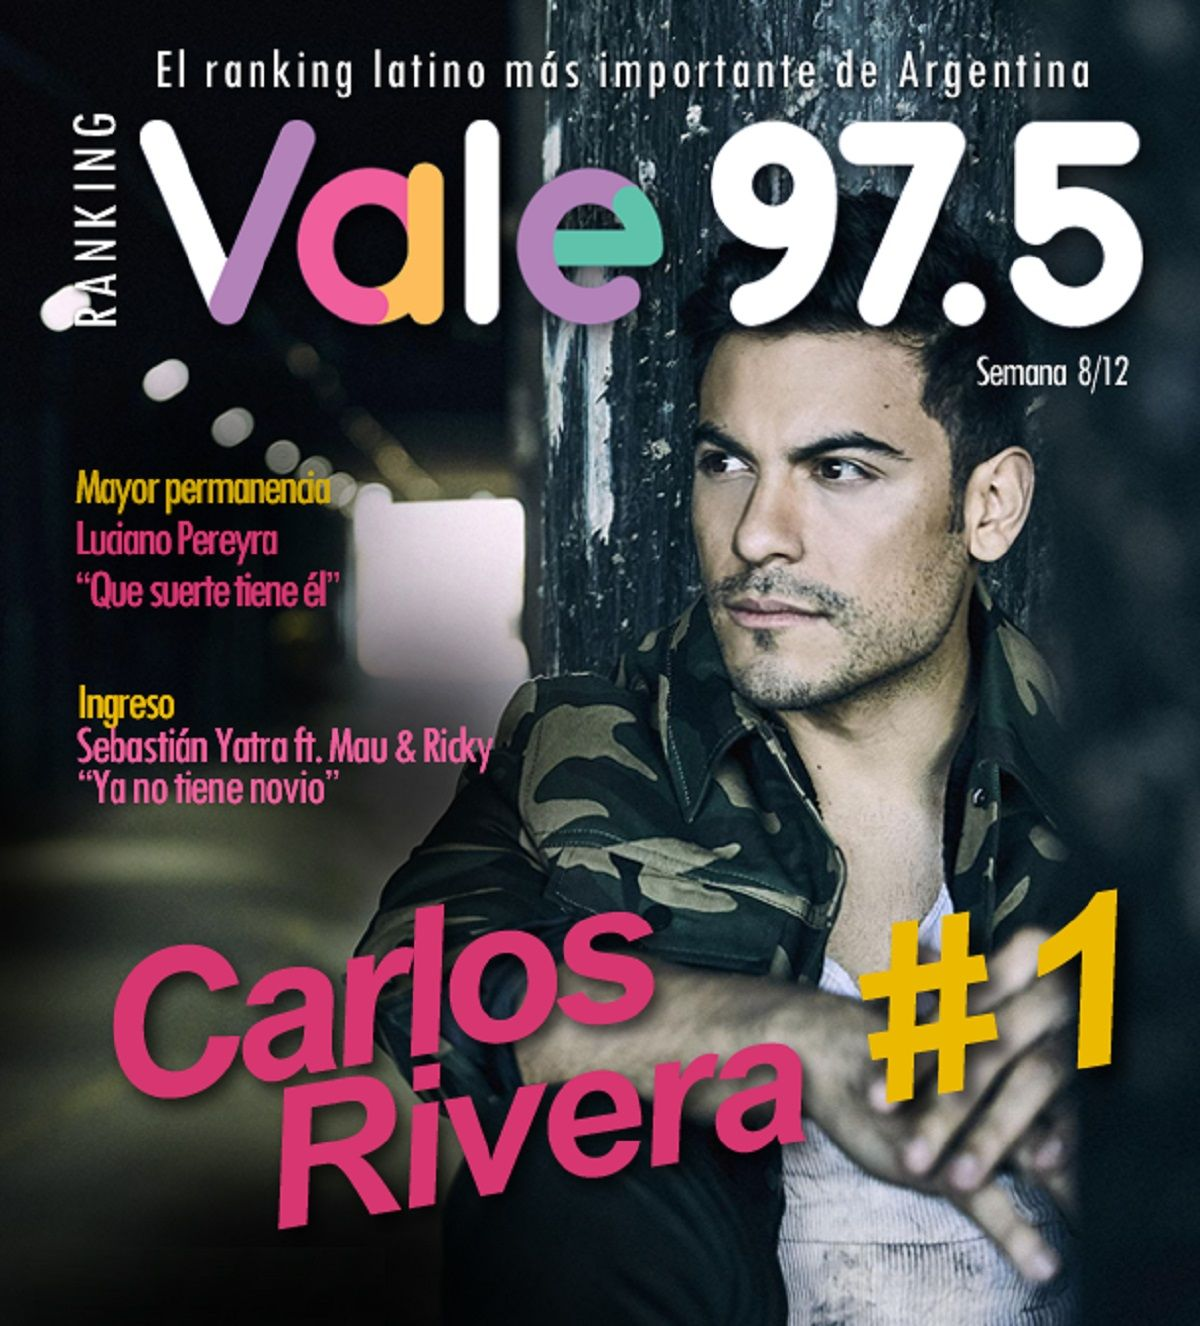 Carlos Rivera, líder absoluto del Ranking Vale